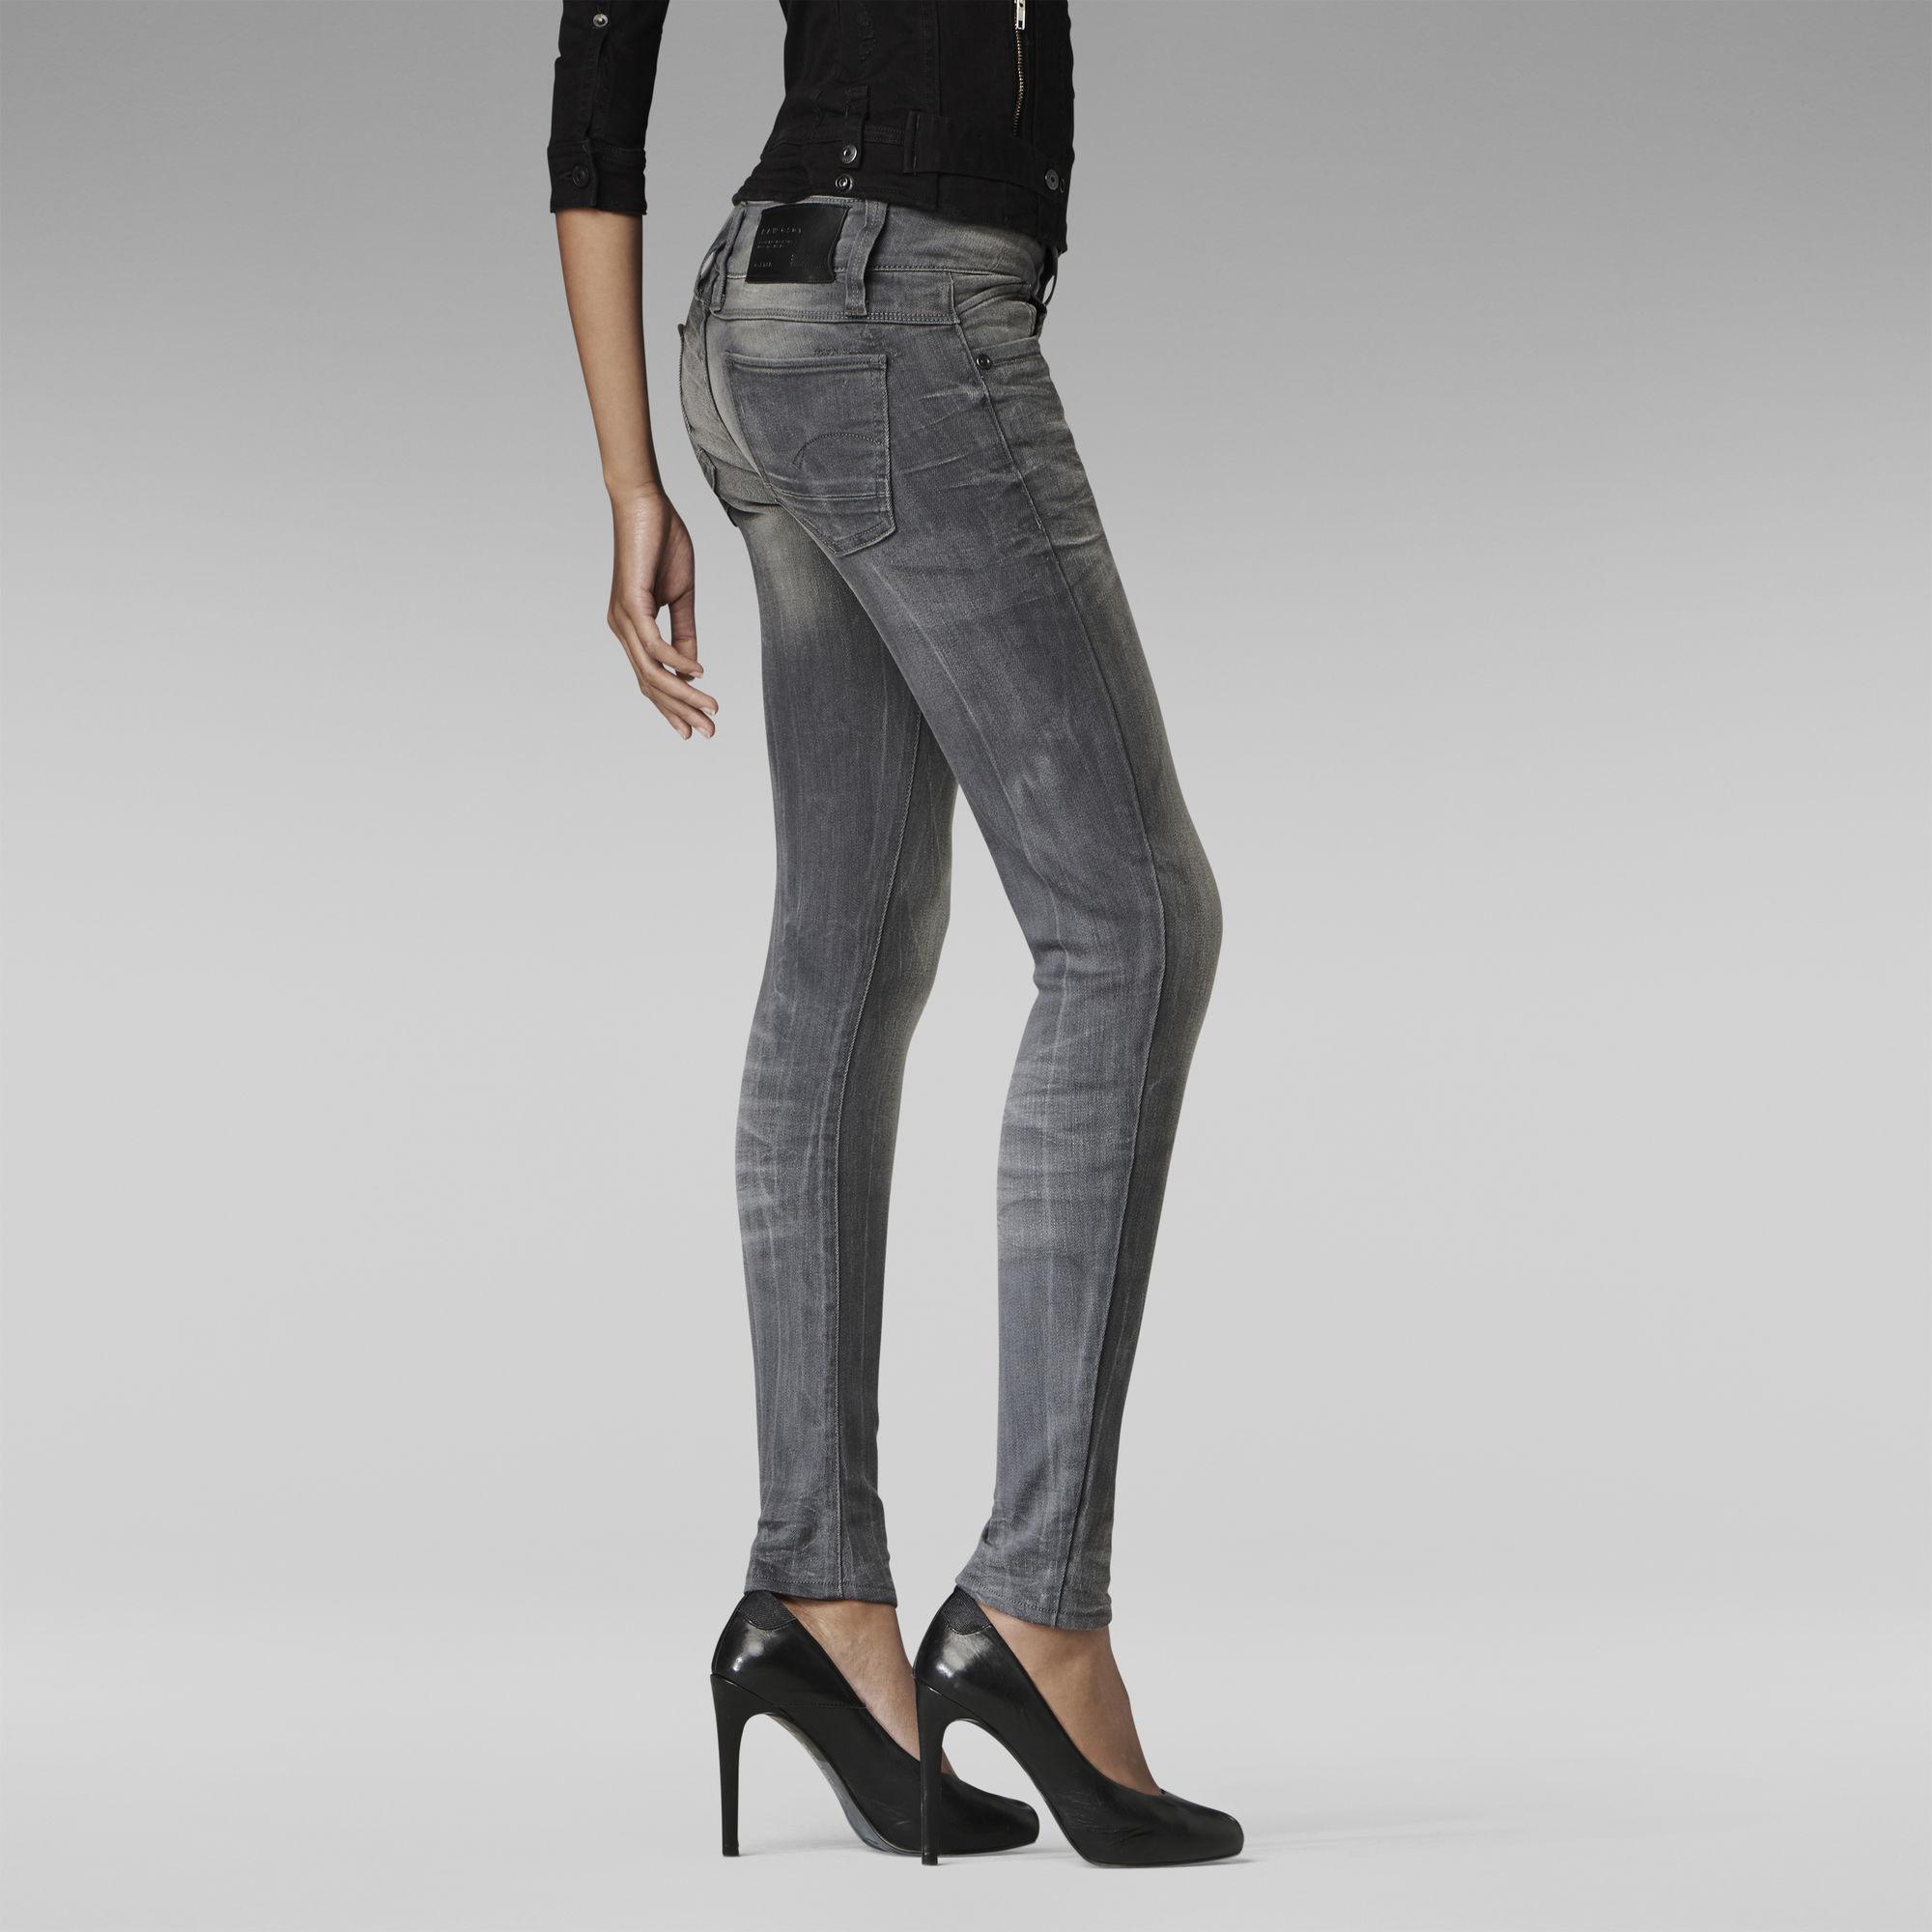 Lynn Zip Skinny Jeans